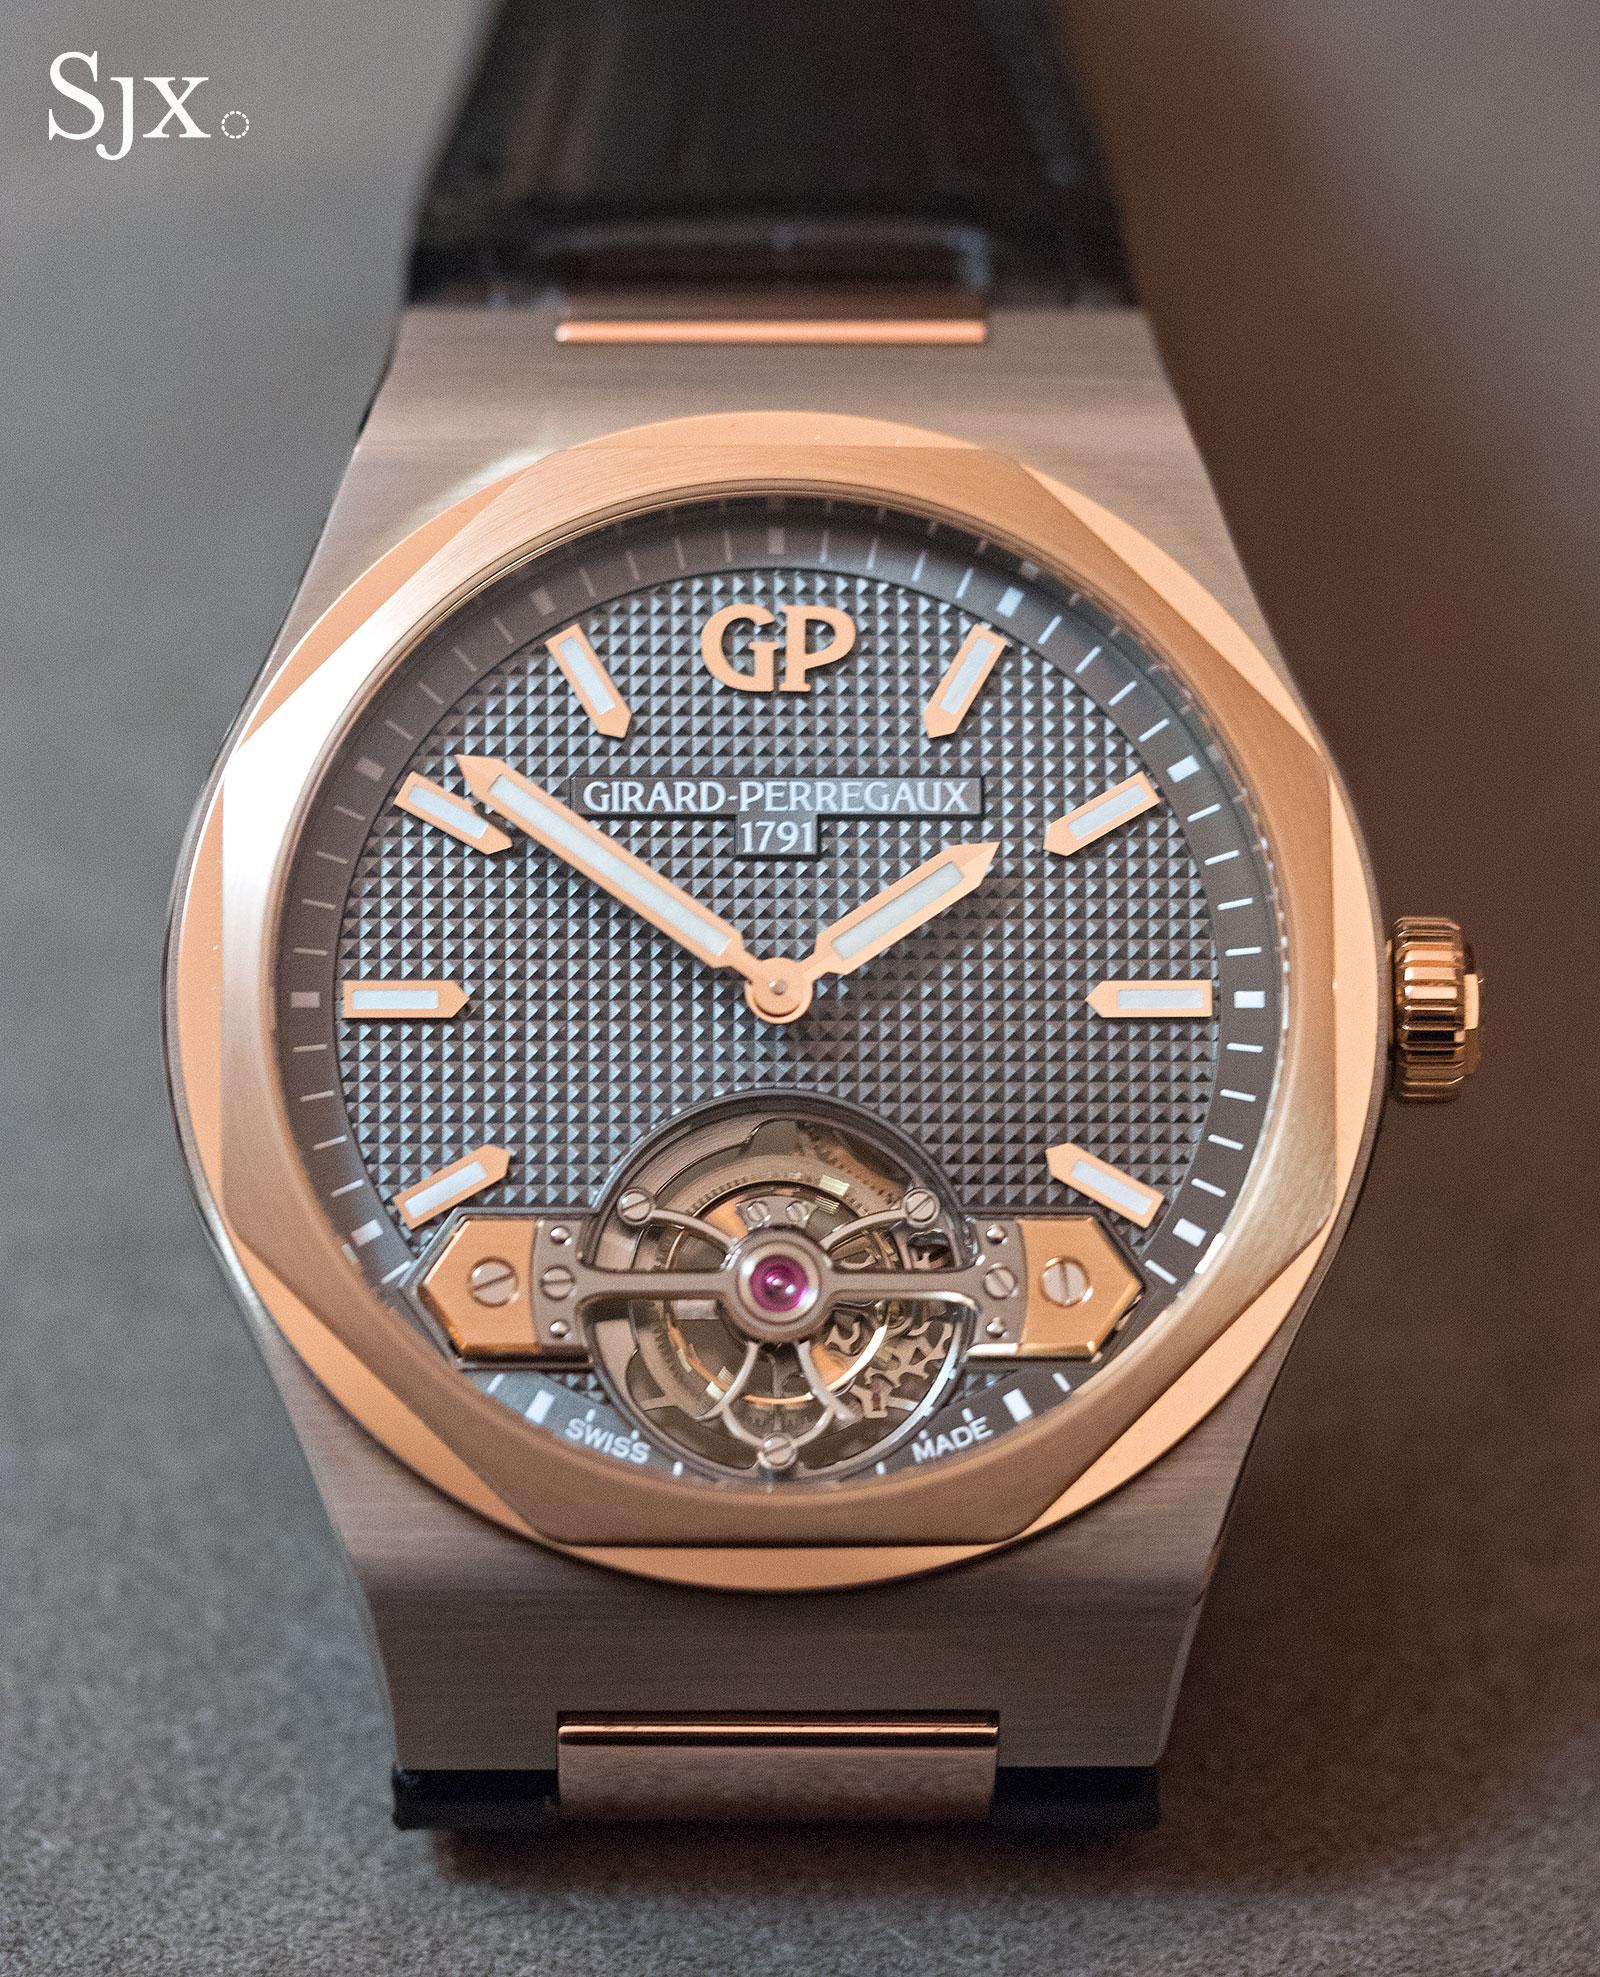 Girard-Perregaux Laureato Tourbillon titanium 1